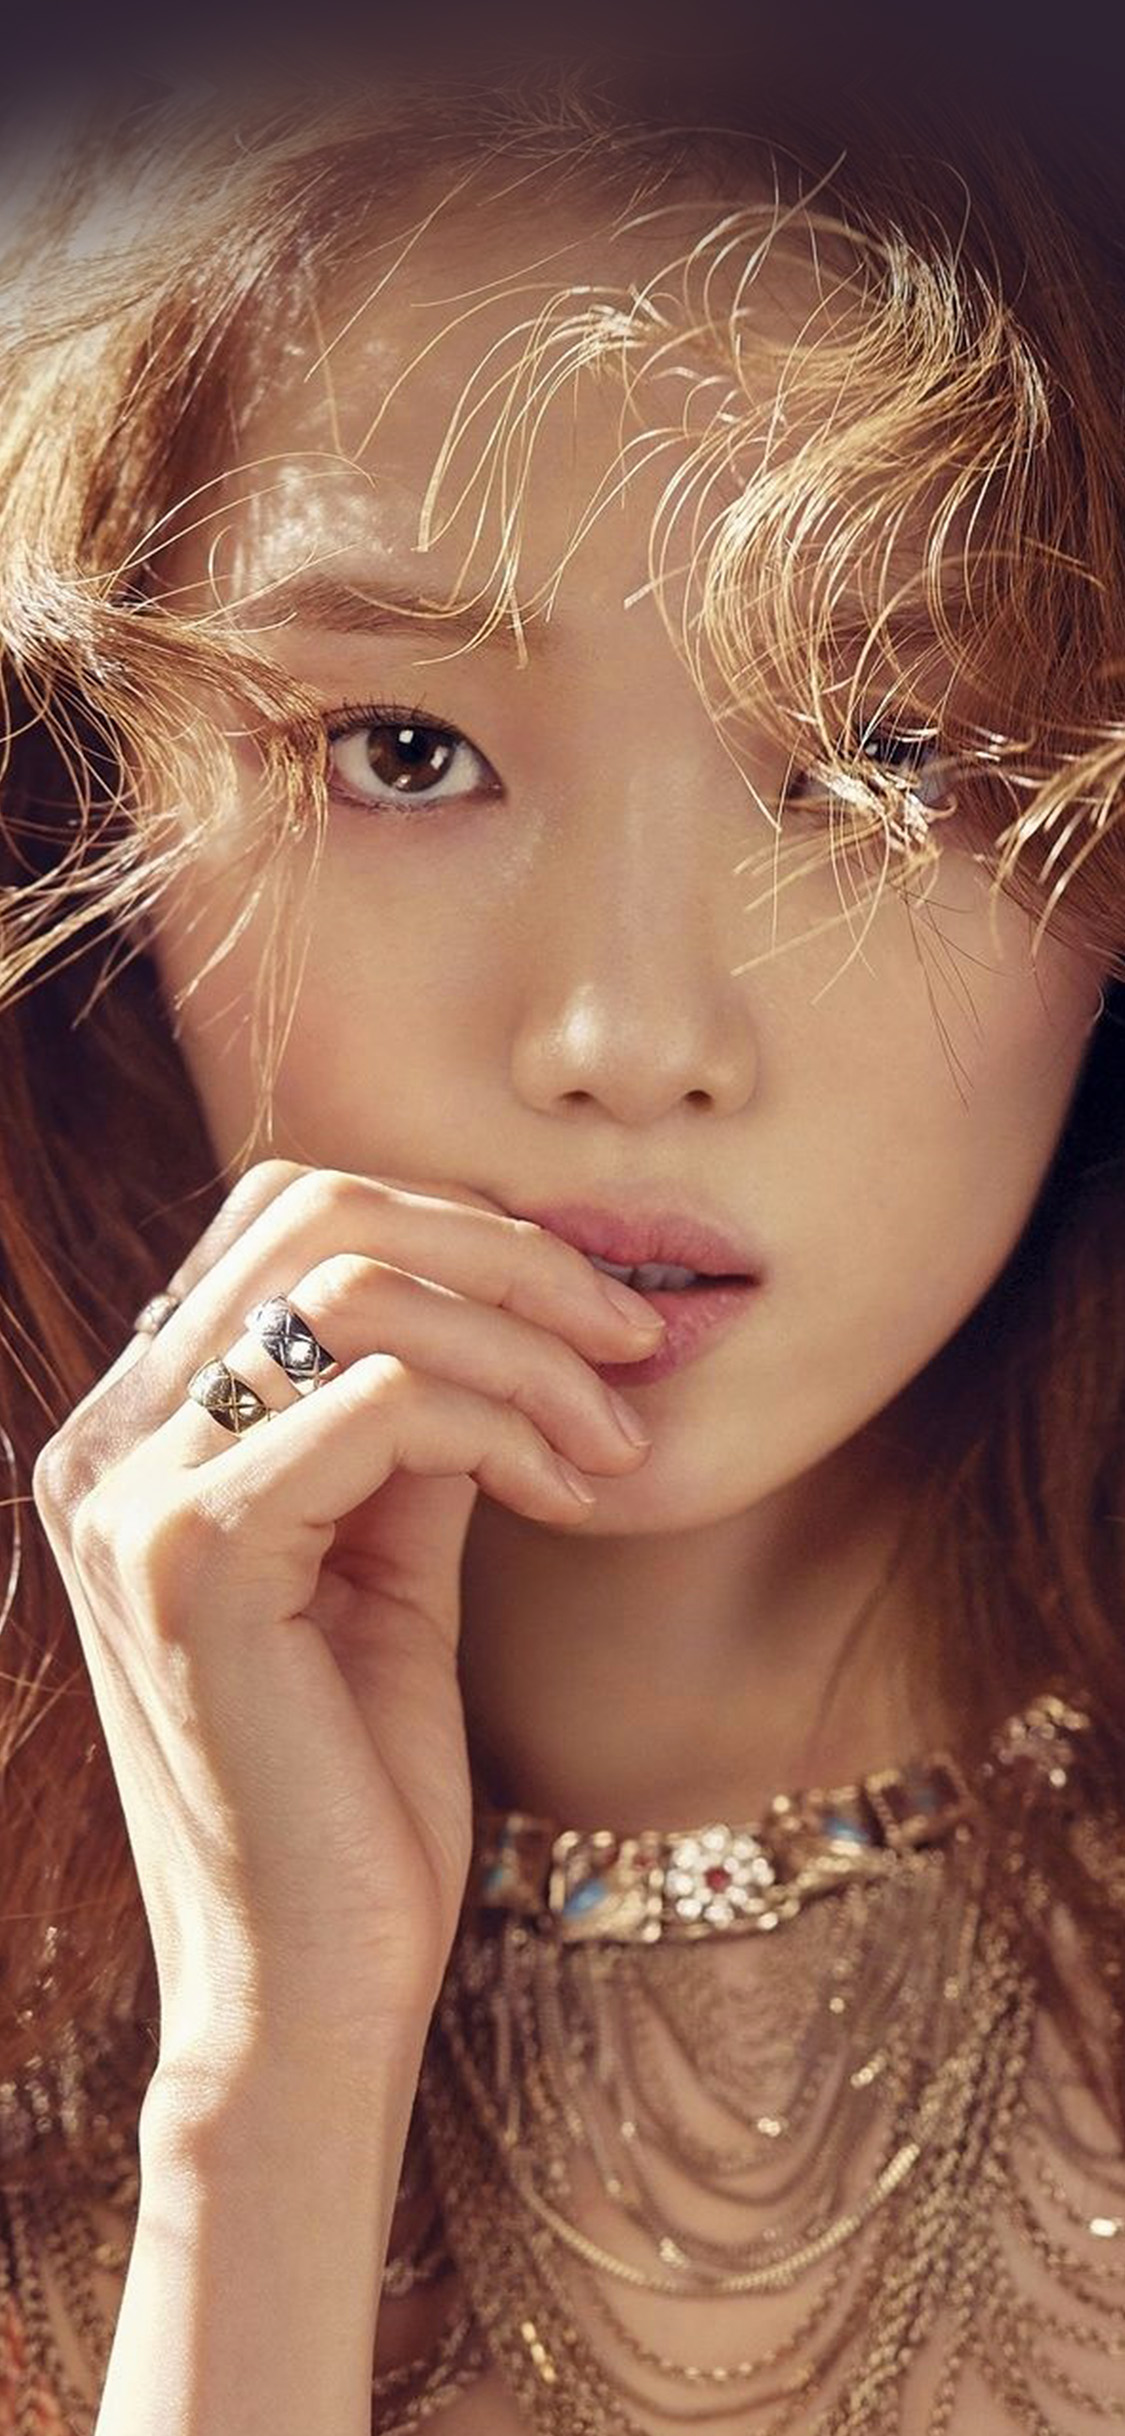 iPhonexpapers.com-Apple-iPhone-wallpaper-ho68-kpop-girl-model-asian-beauty